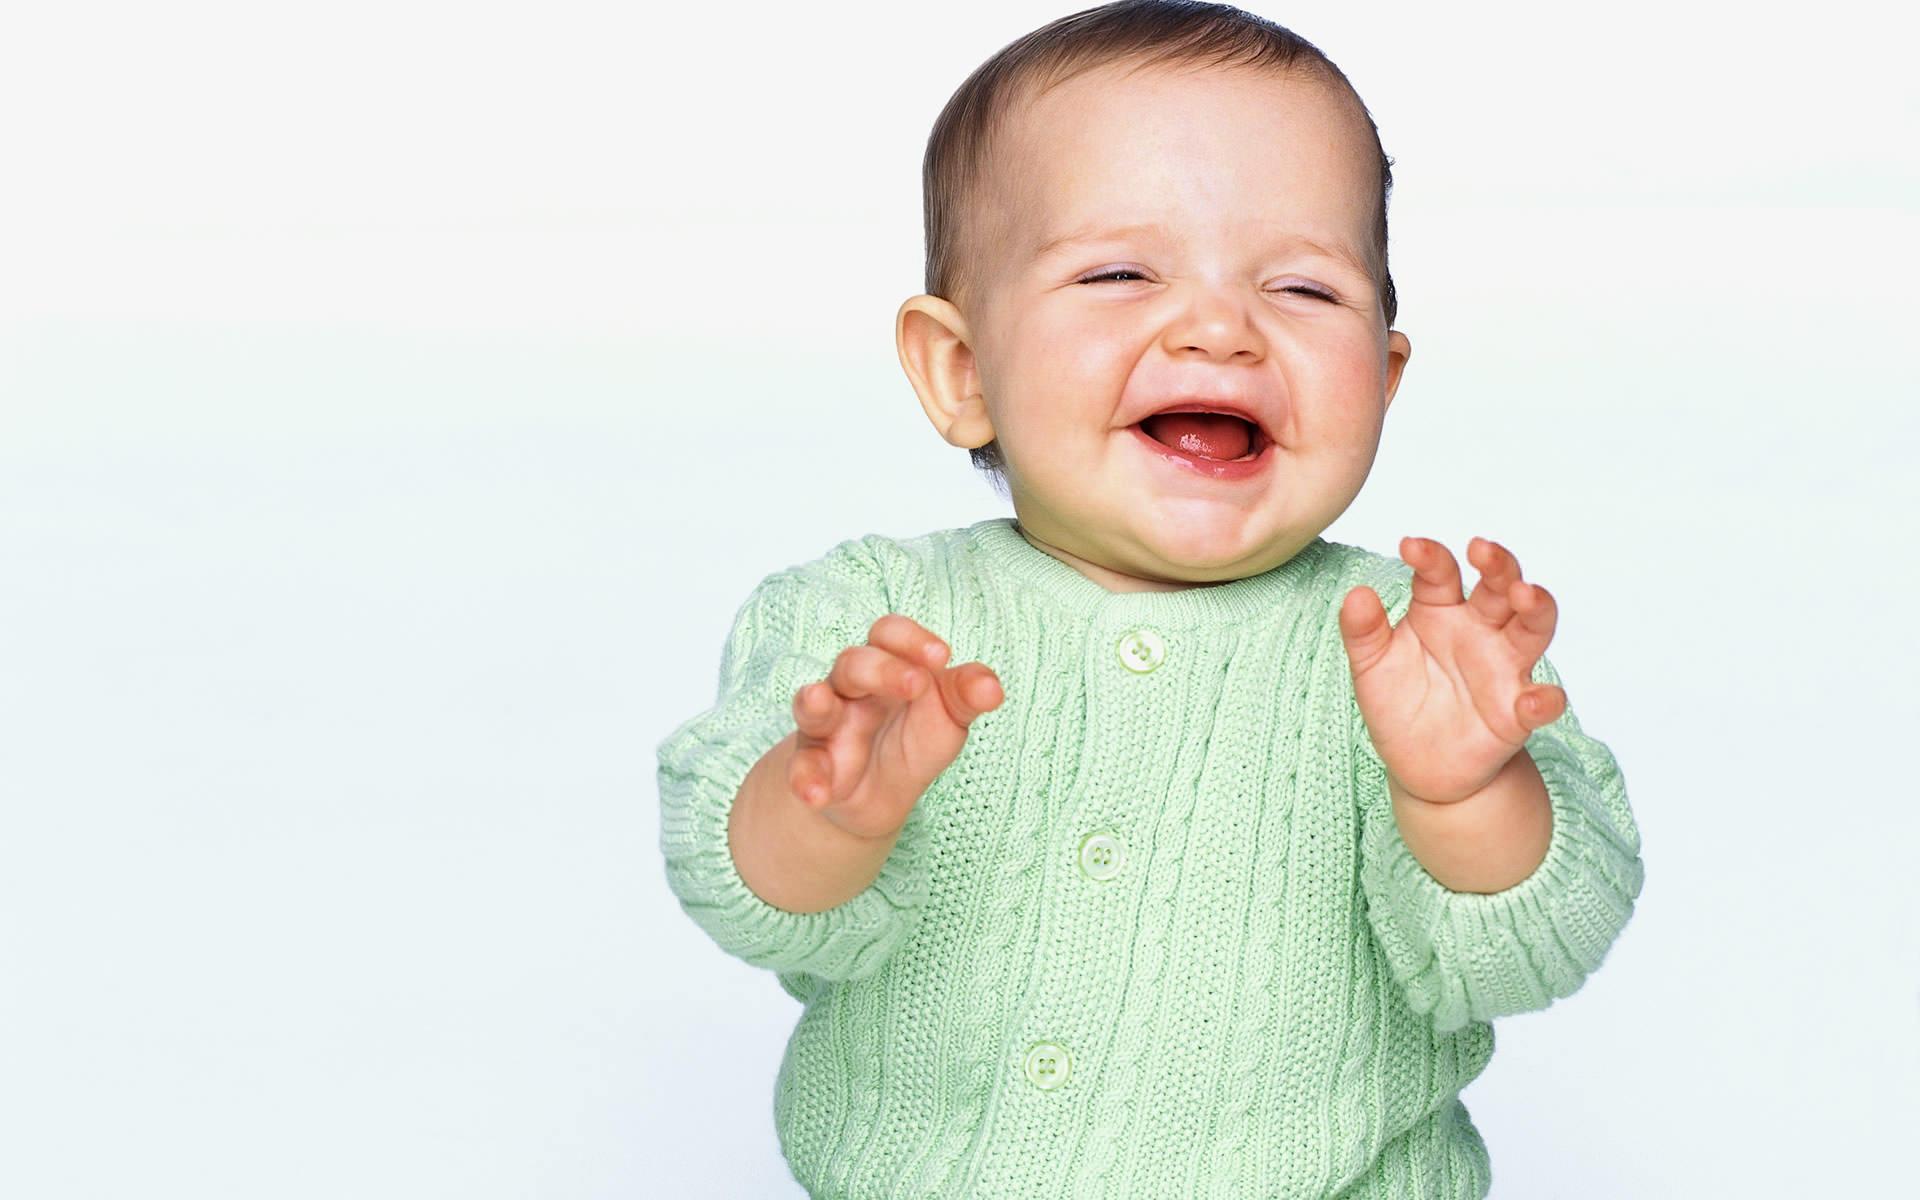 اضكو ههههههههههههههههههههههههههههههههههههههههههههههههههههههه Laughing-baby-background-1920x1200-1002040